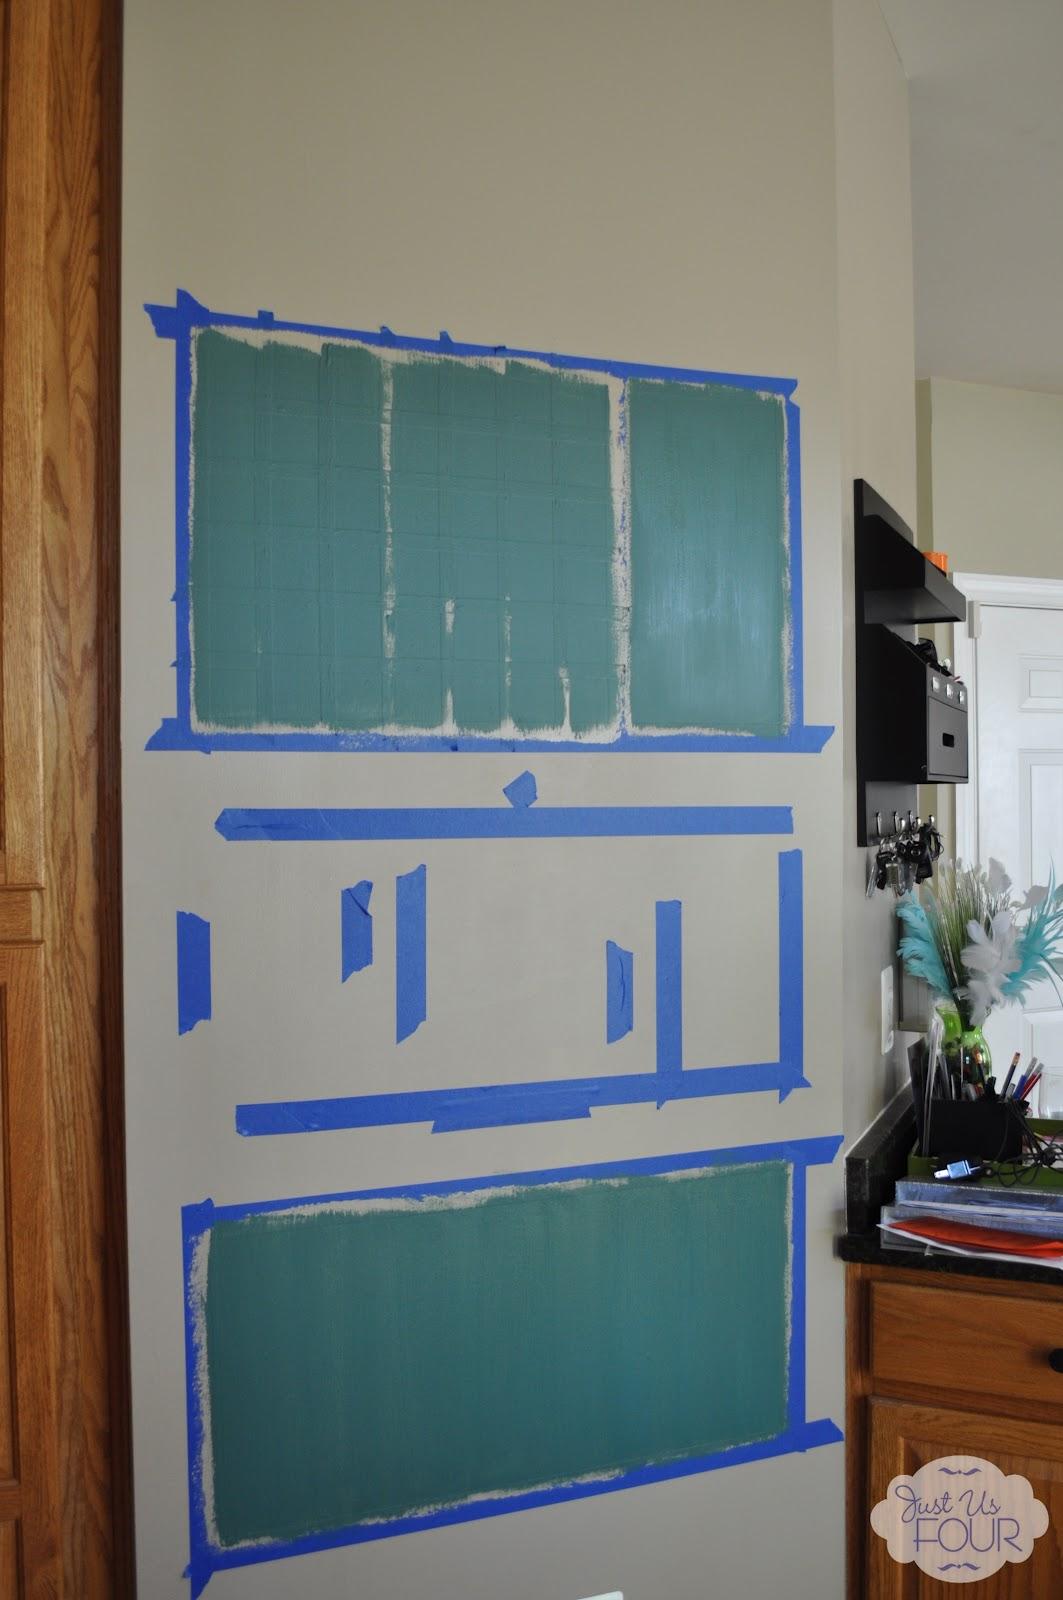 Chalkboard Command Center - My Suburban Kitchen